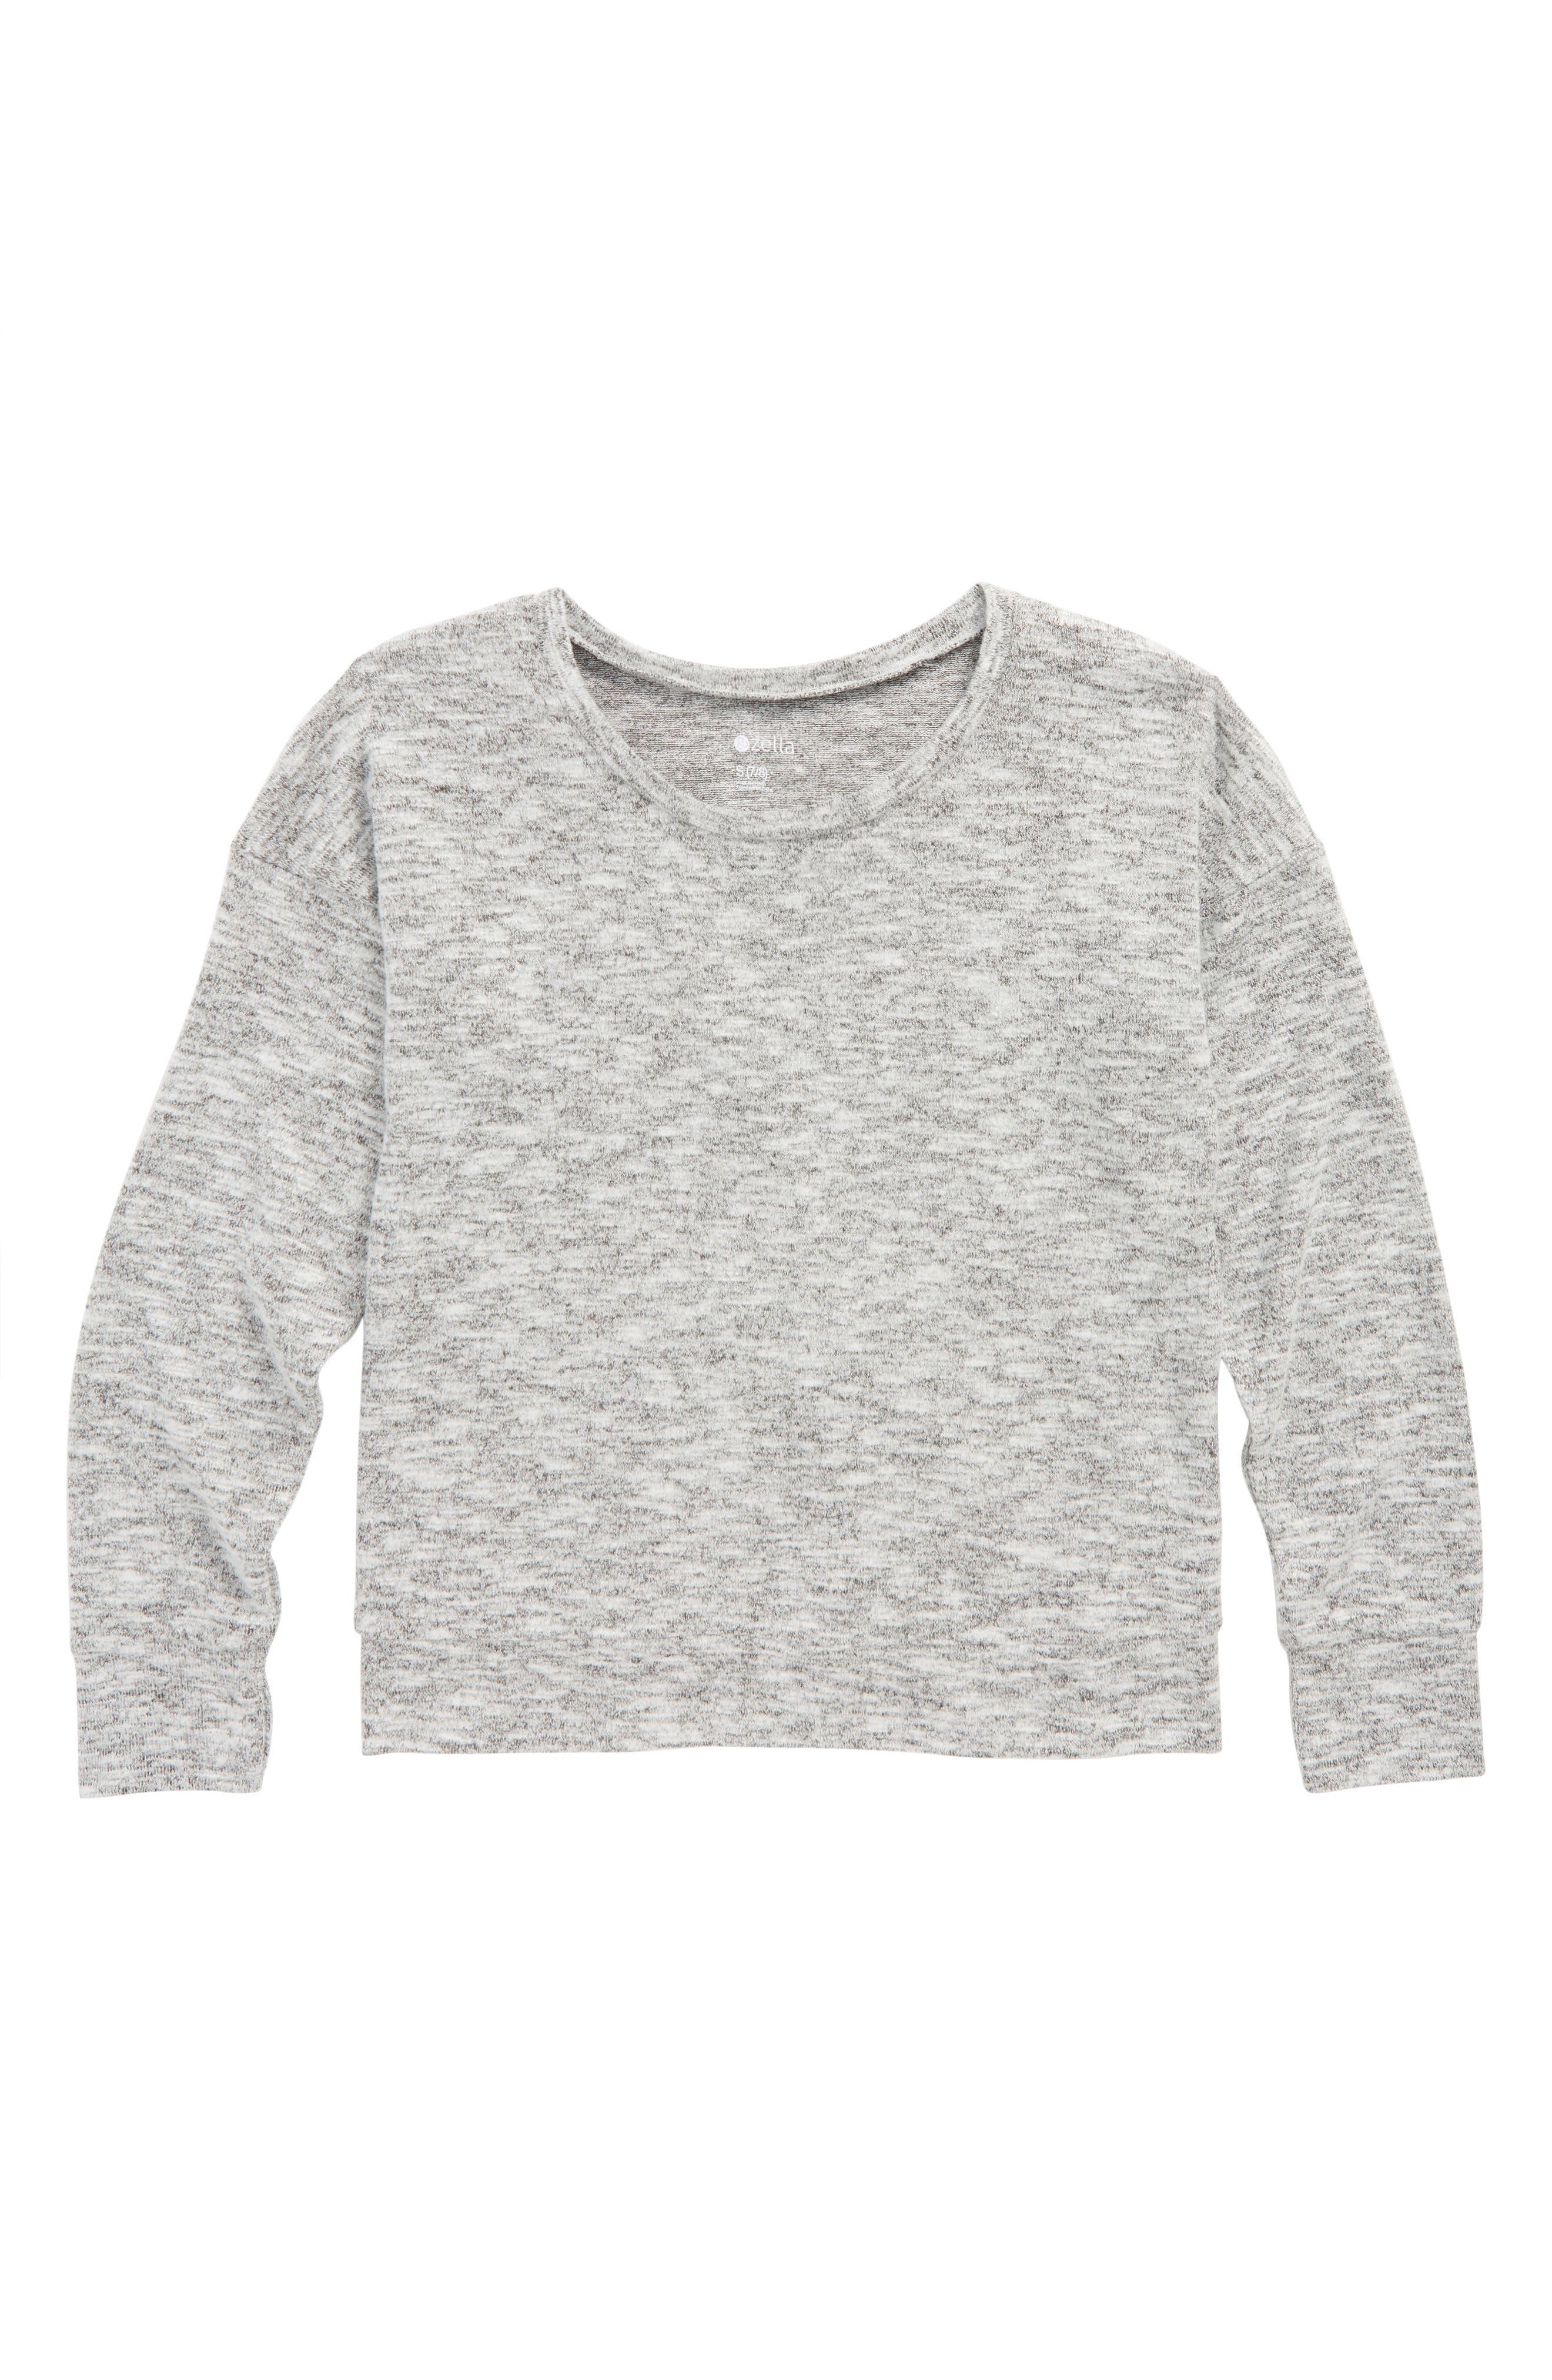 Main Image - Zella Open Back Sweater (Little Girls & Big Girls)